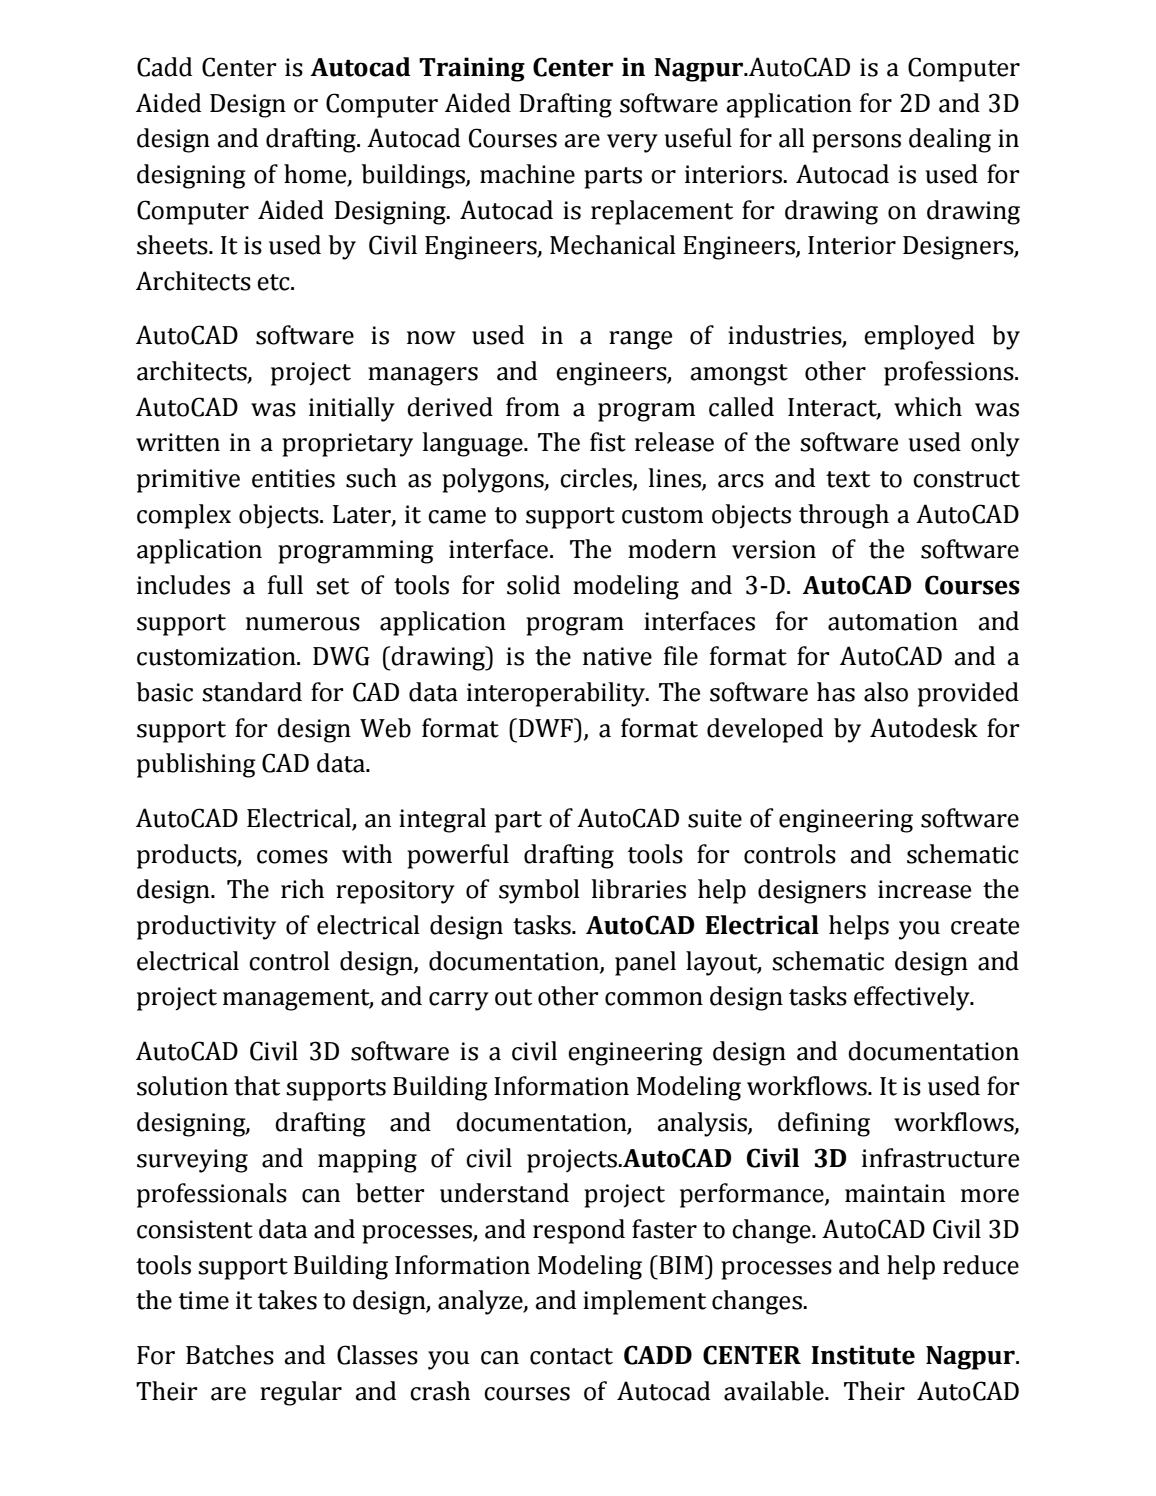 Autocad Training Institute Nagpur By Caddcentrenag Issuu Electrical Schematic Classes